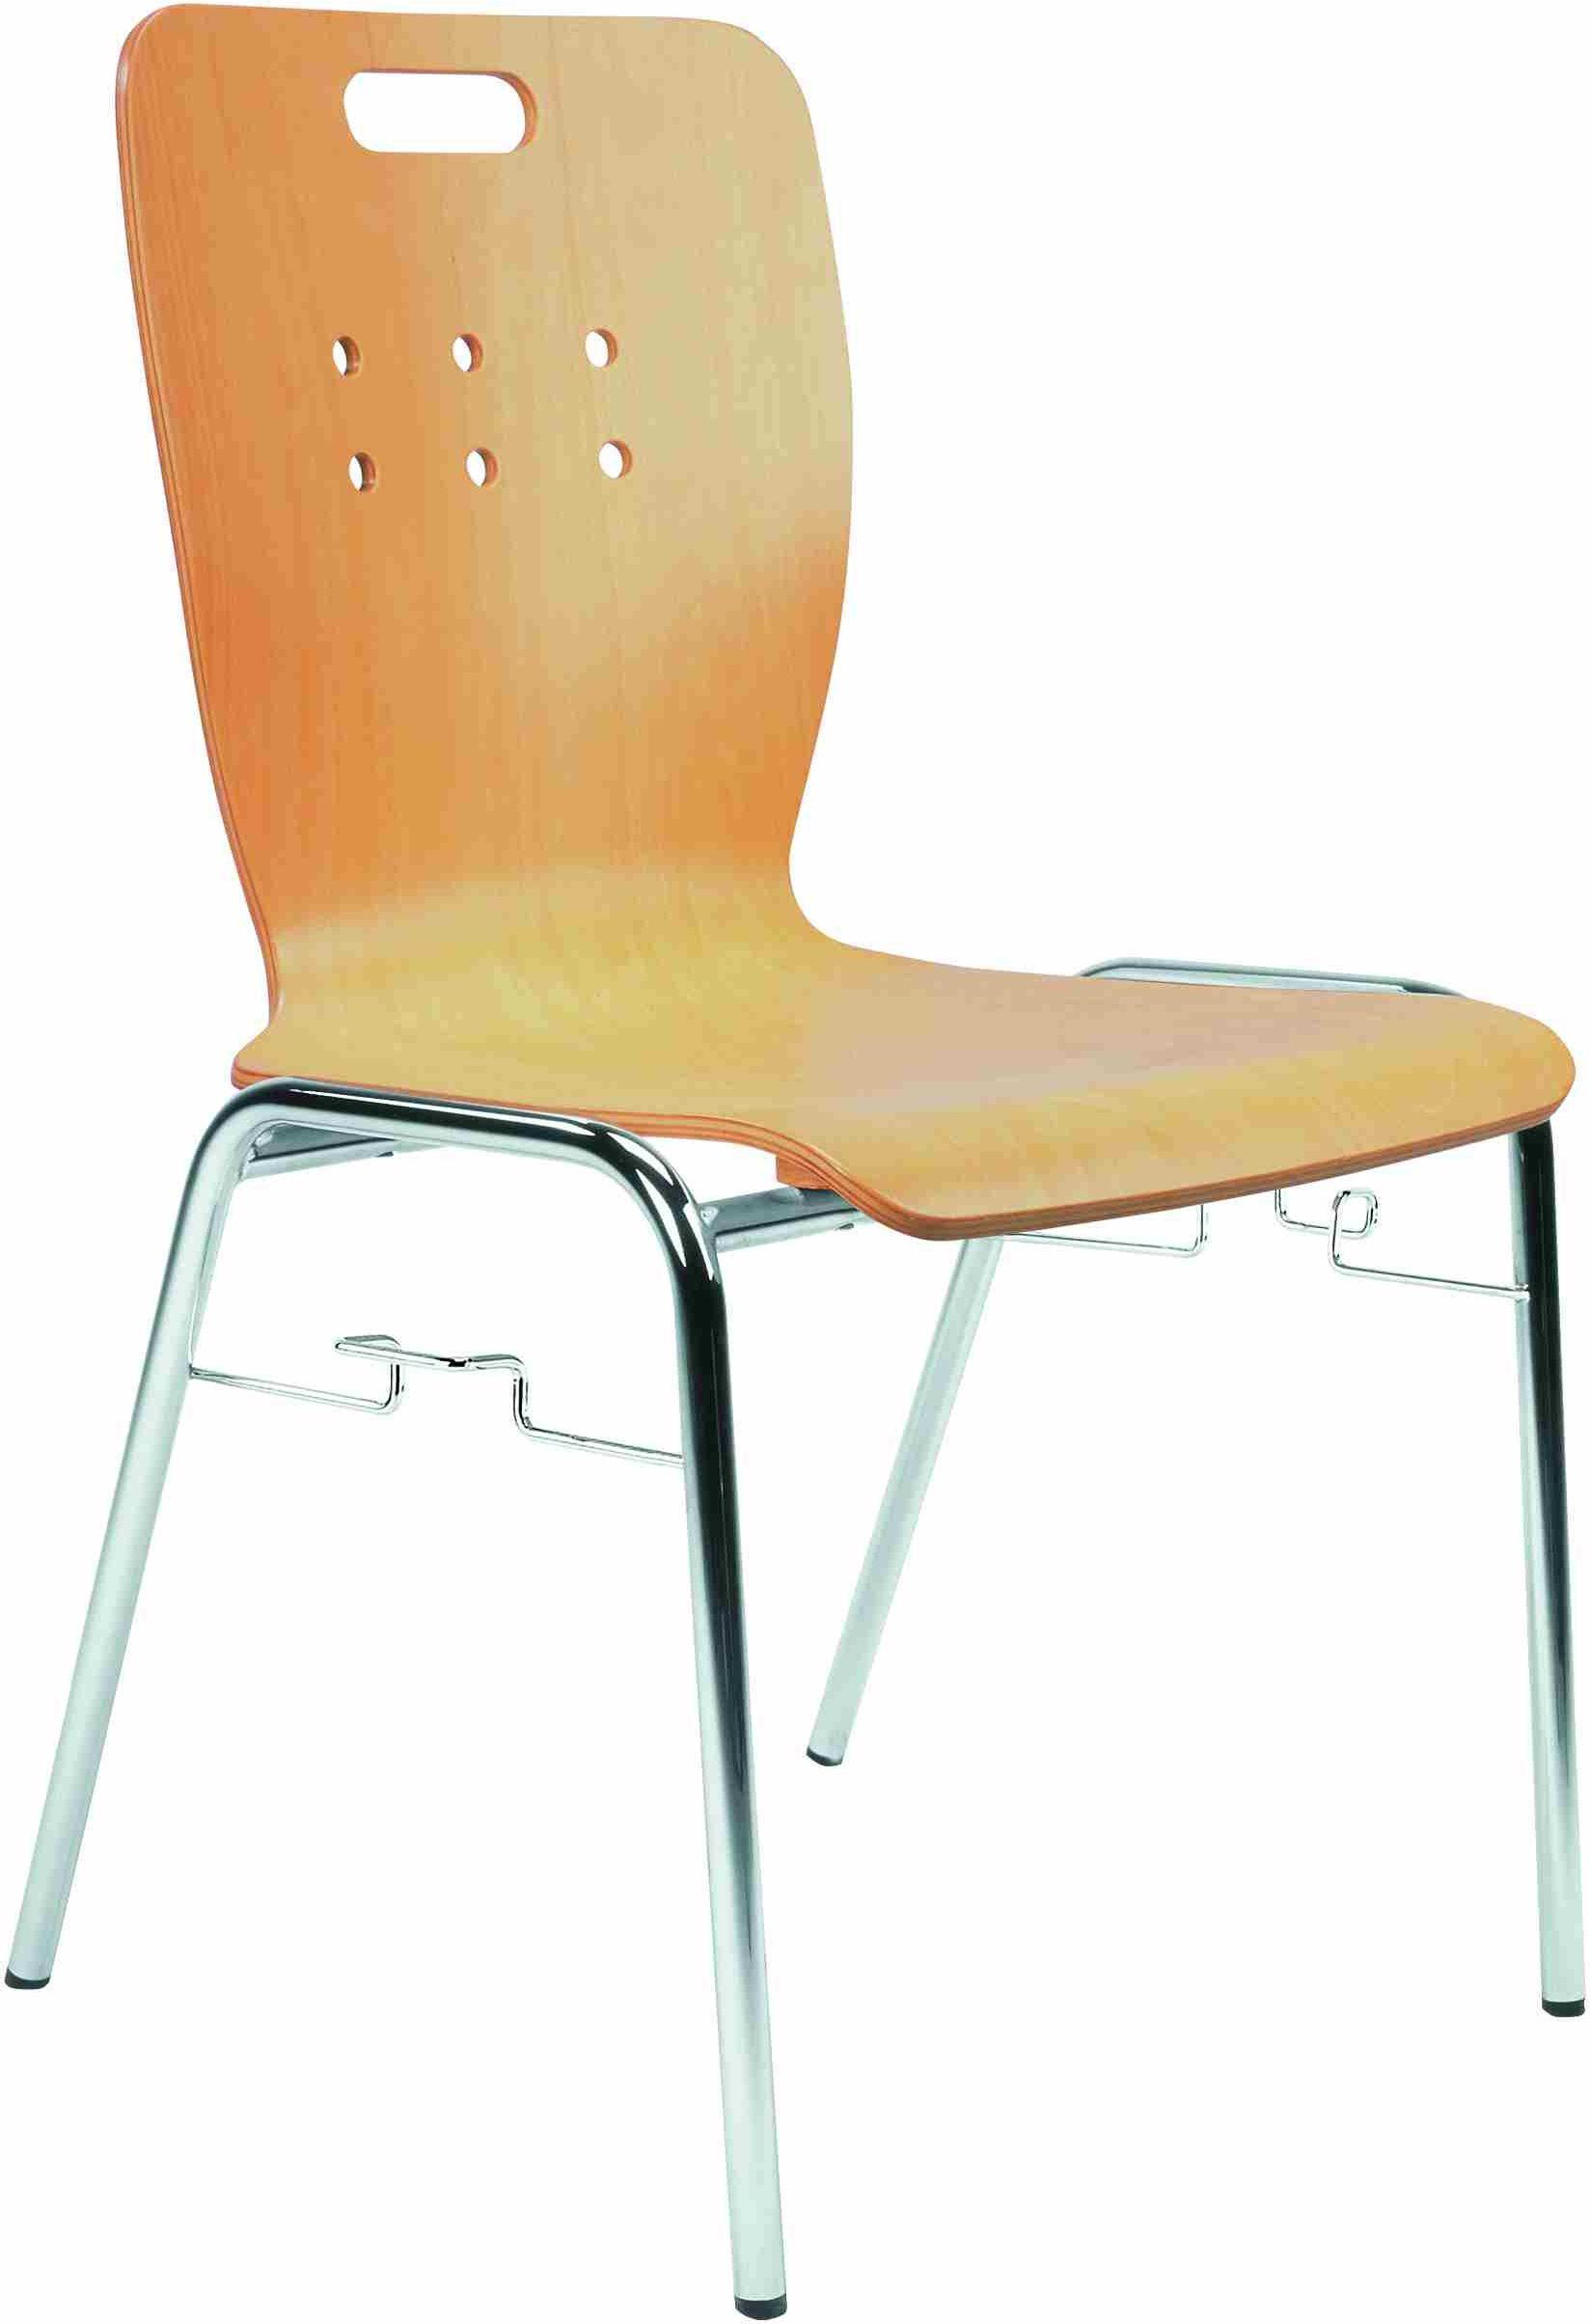 NOWY STYL Krzesło WING II.20 click